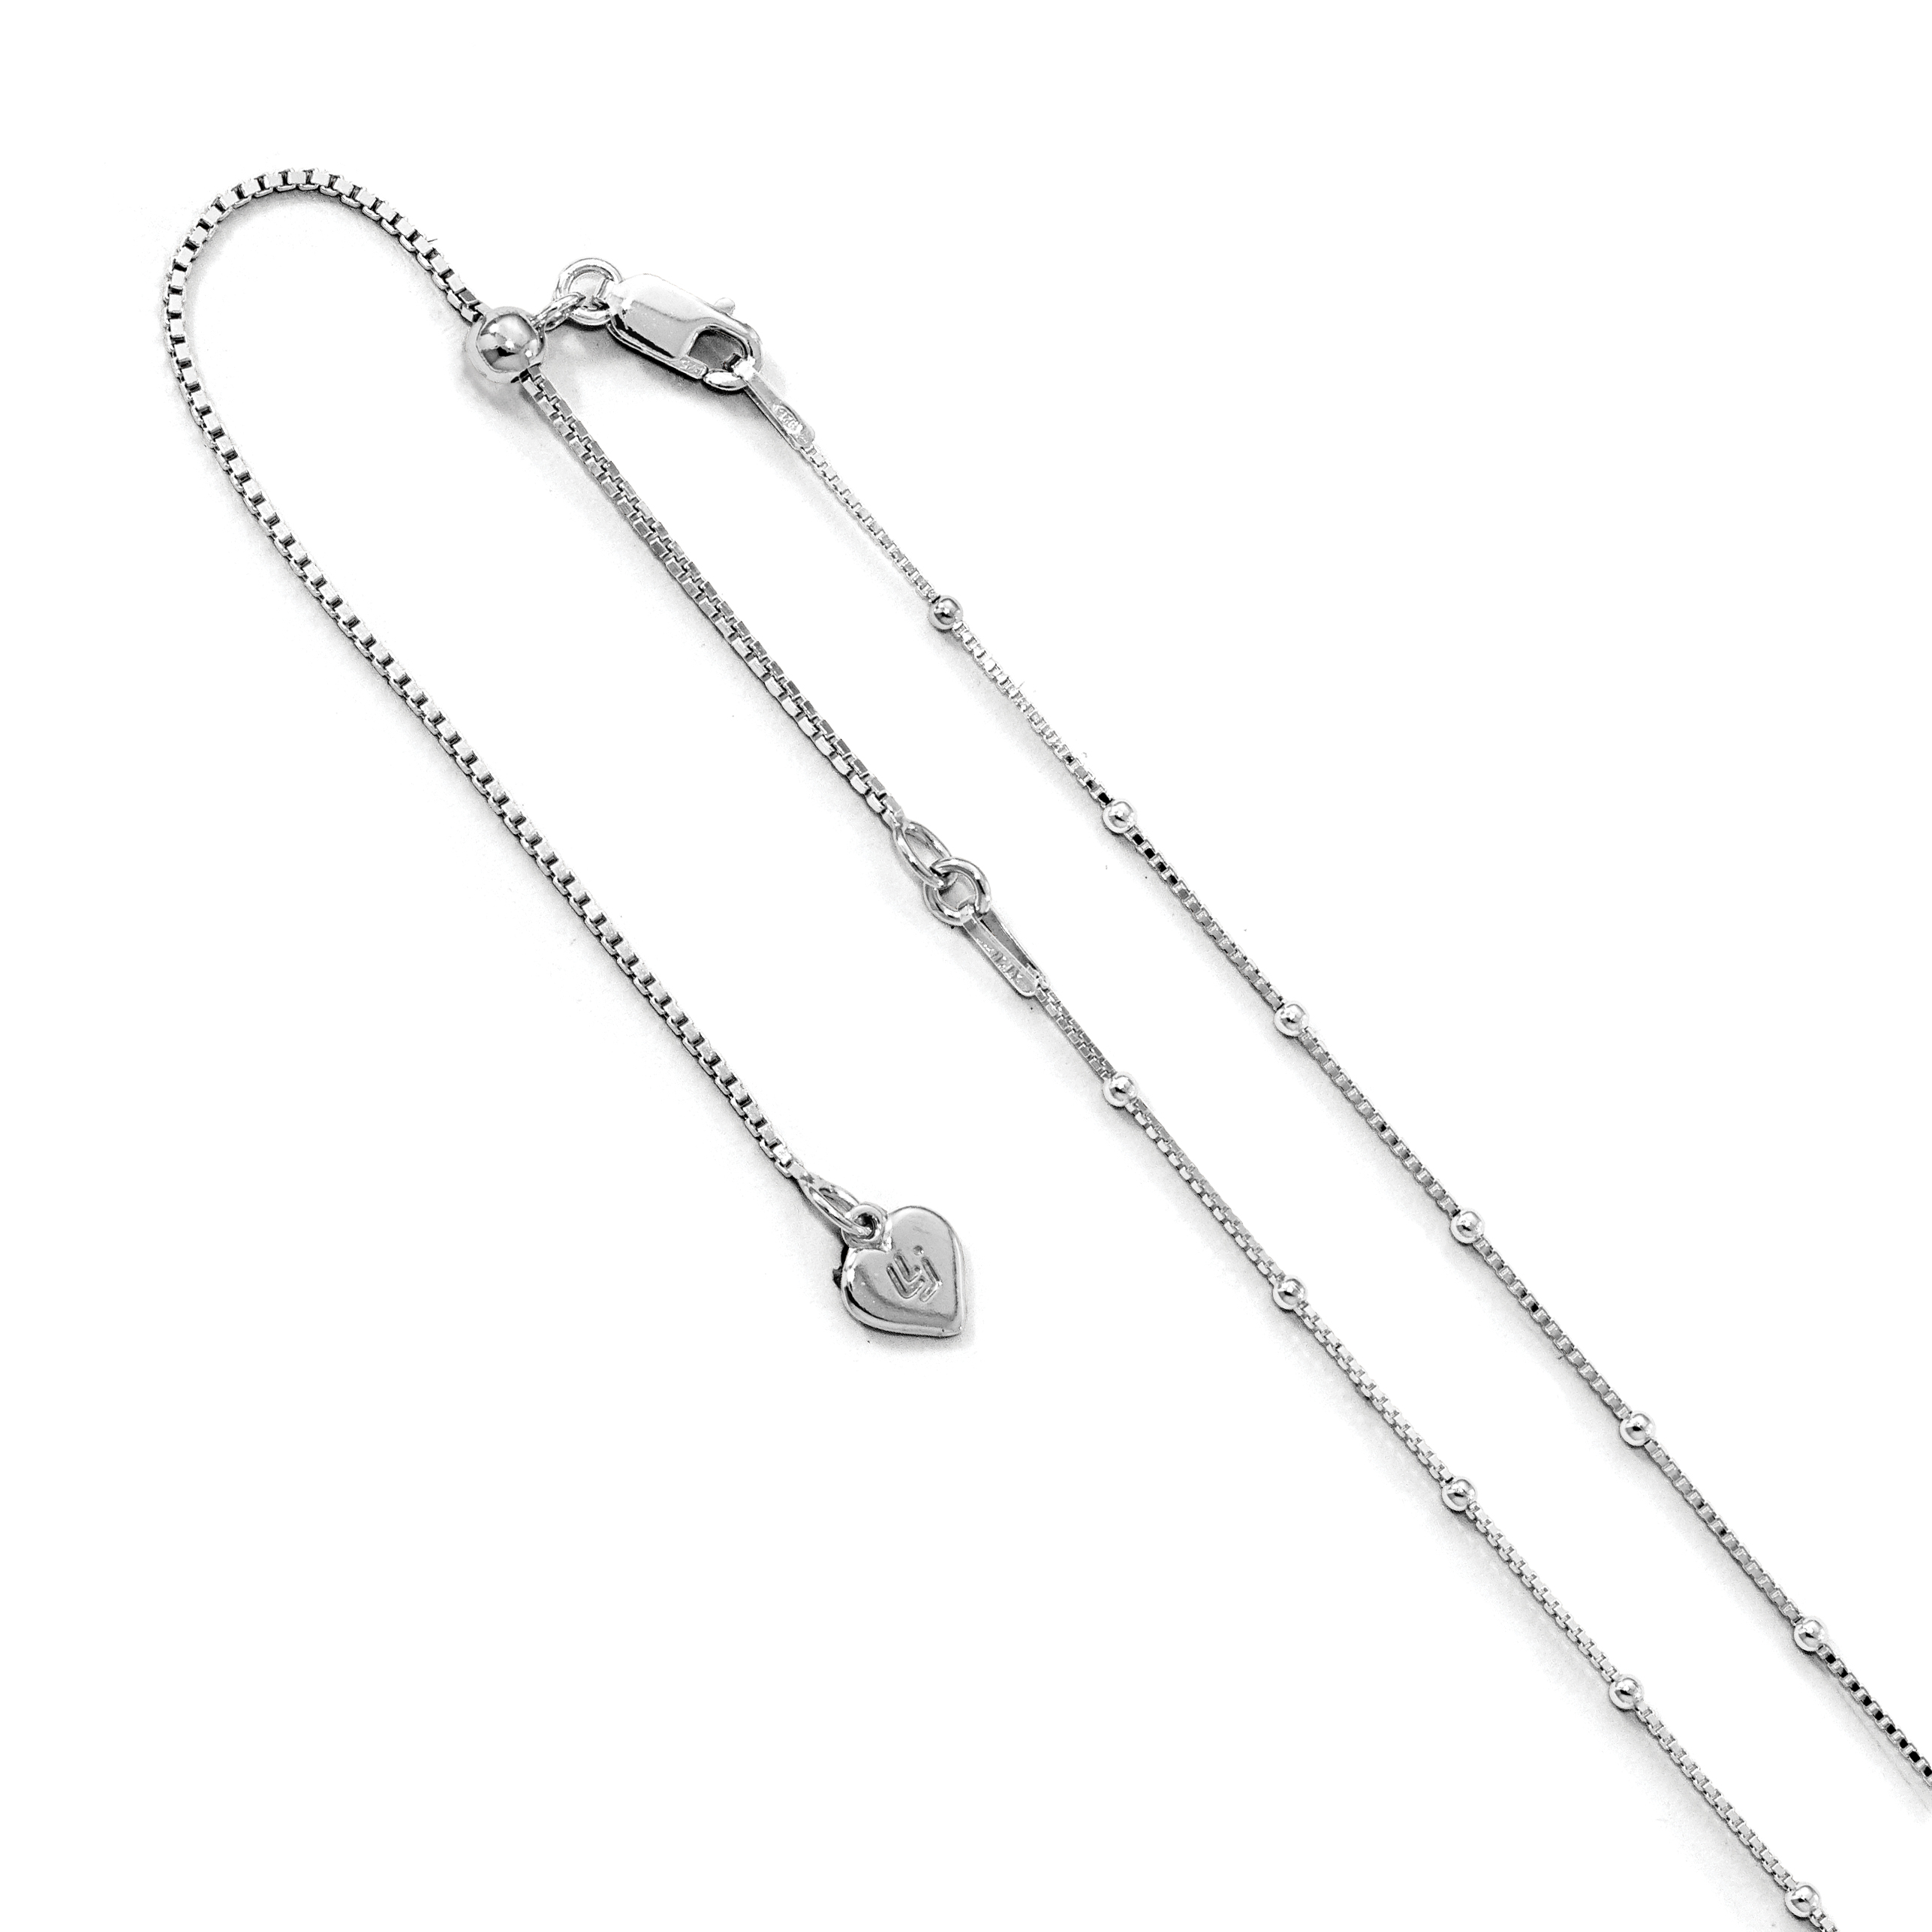 Adjustable Box w/ Beads